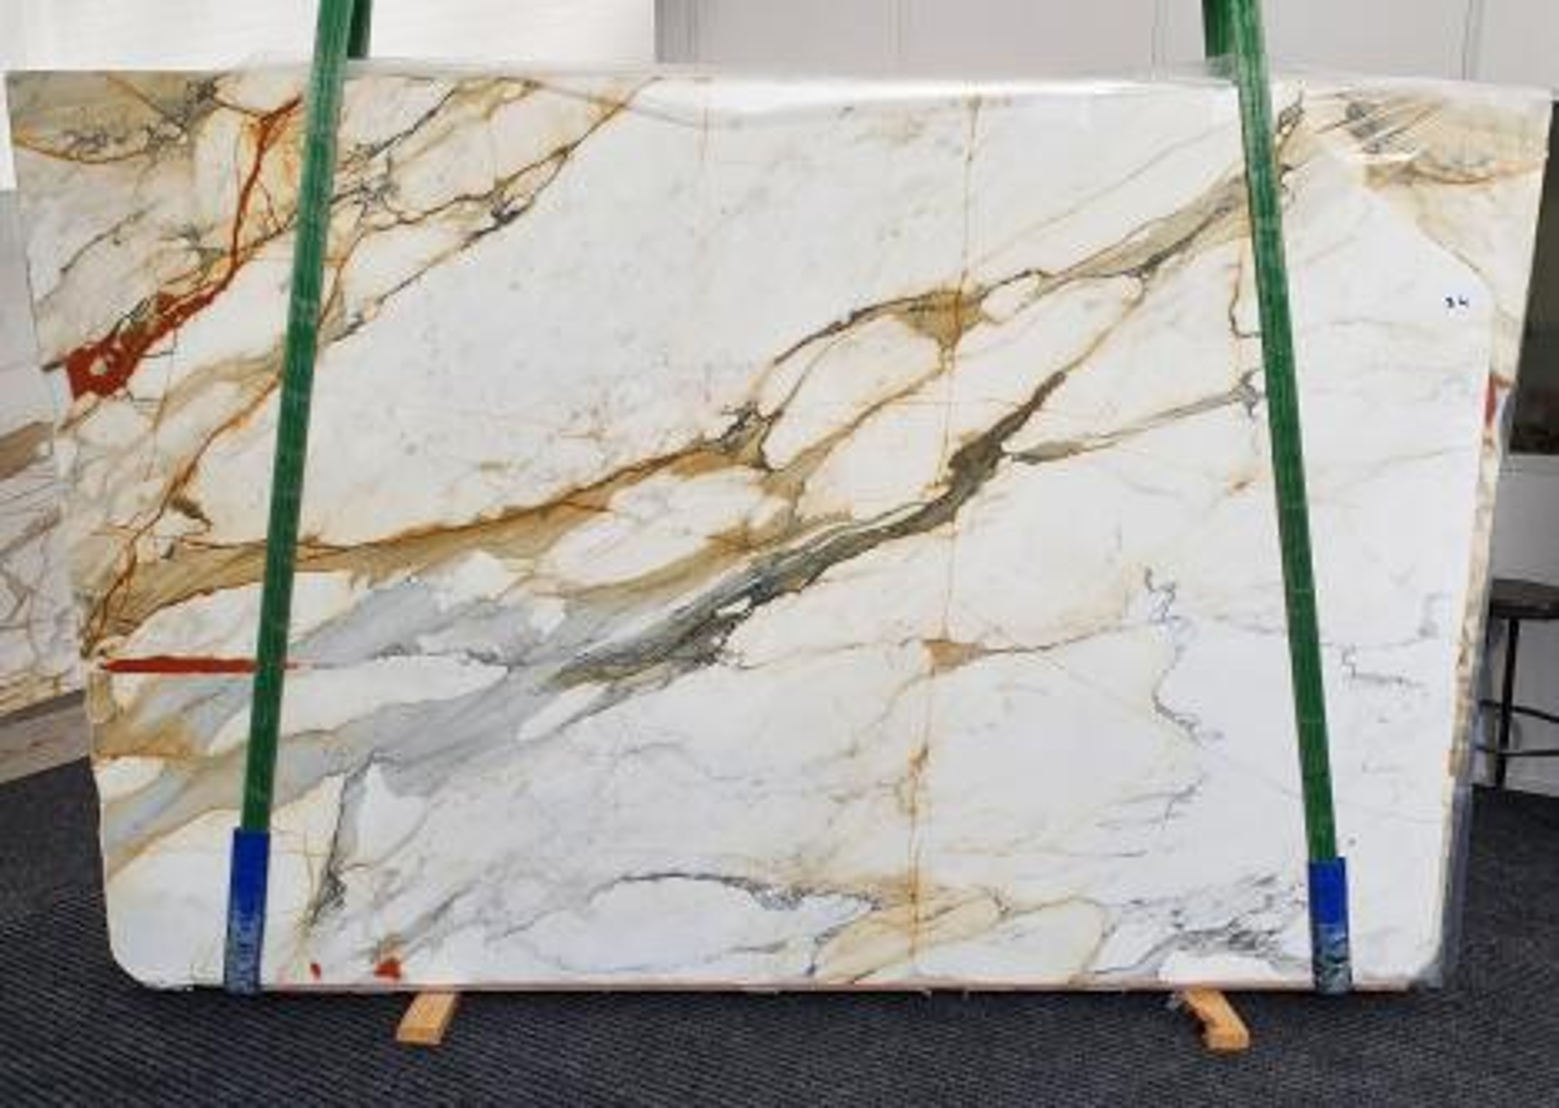 CALACATTA MACCHIAVECCHIA Suministro Veneto (Italia) de planchas pulidas en mármol natural 1422 , Slab #34